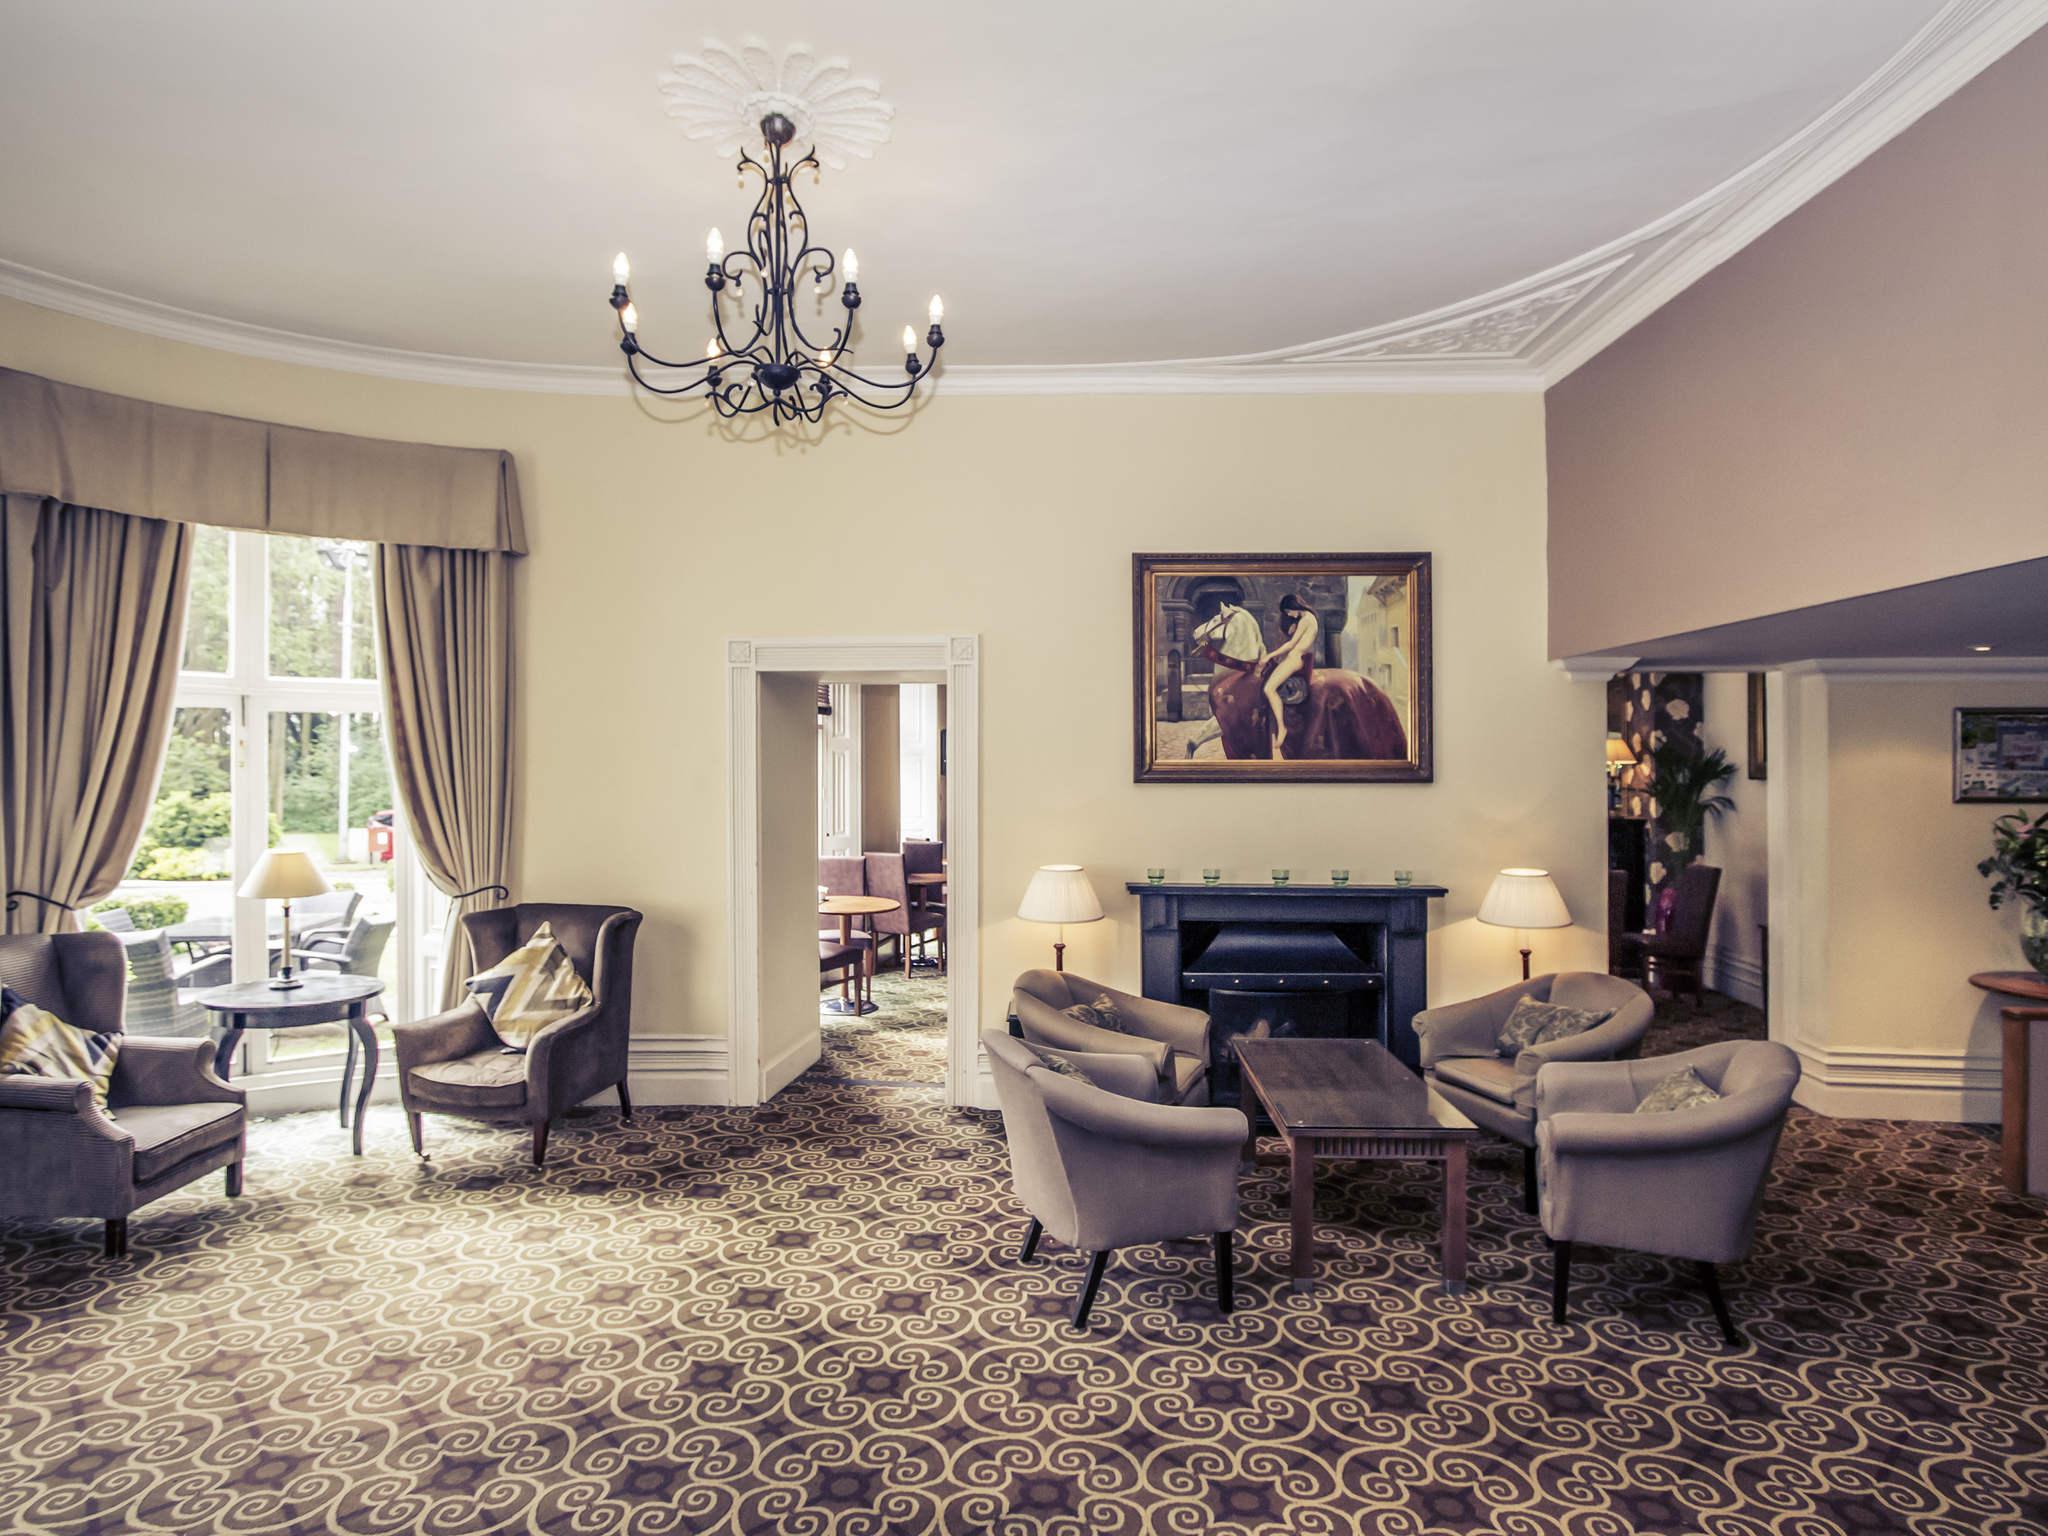 Mercure Brandon Hall Hotel Coventry